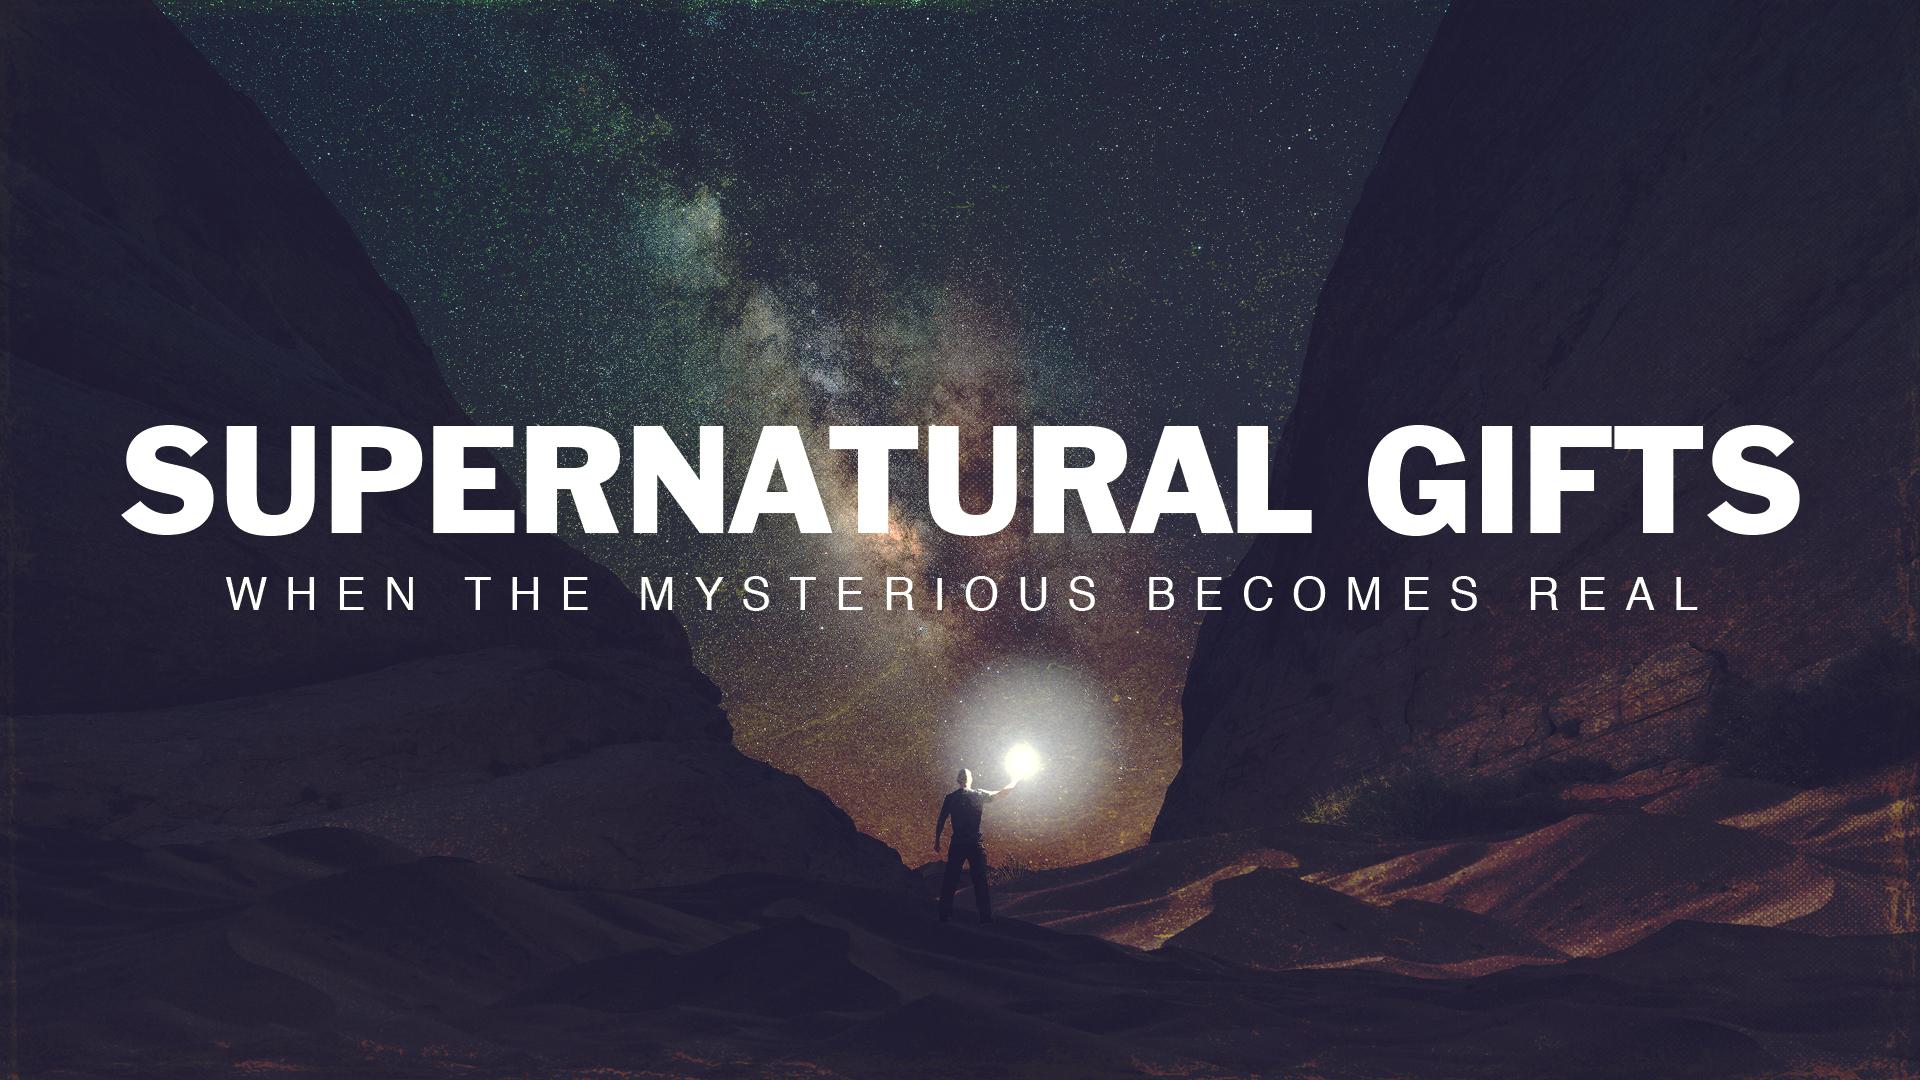 Supernatural Gifts Title 16x9.jpg